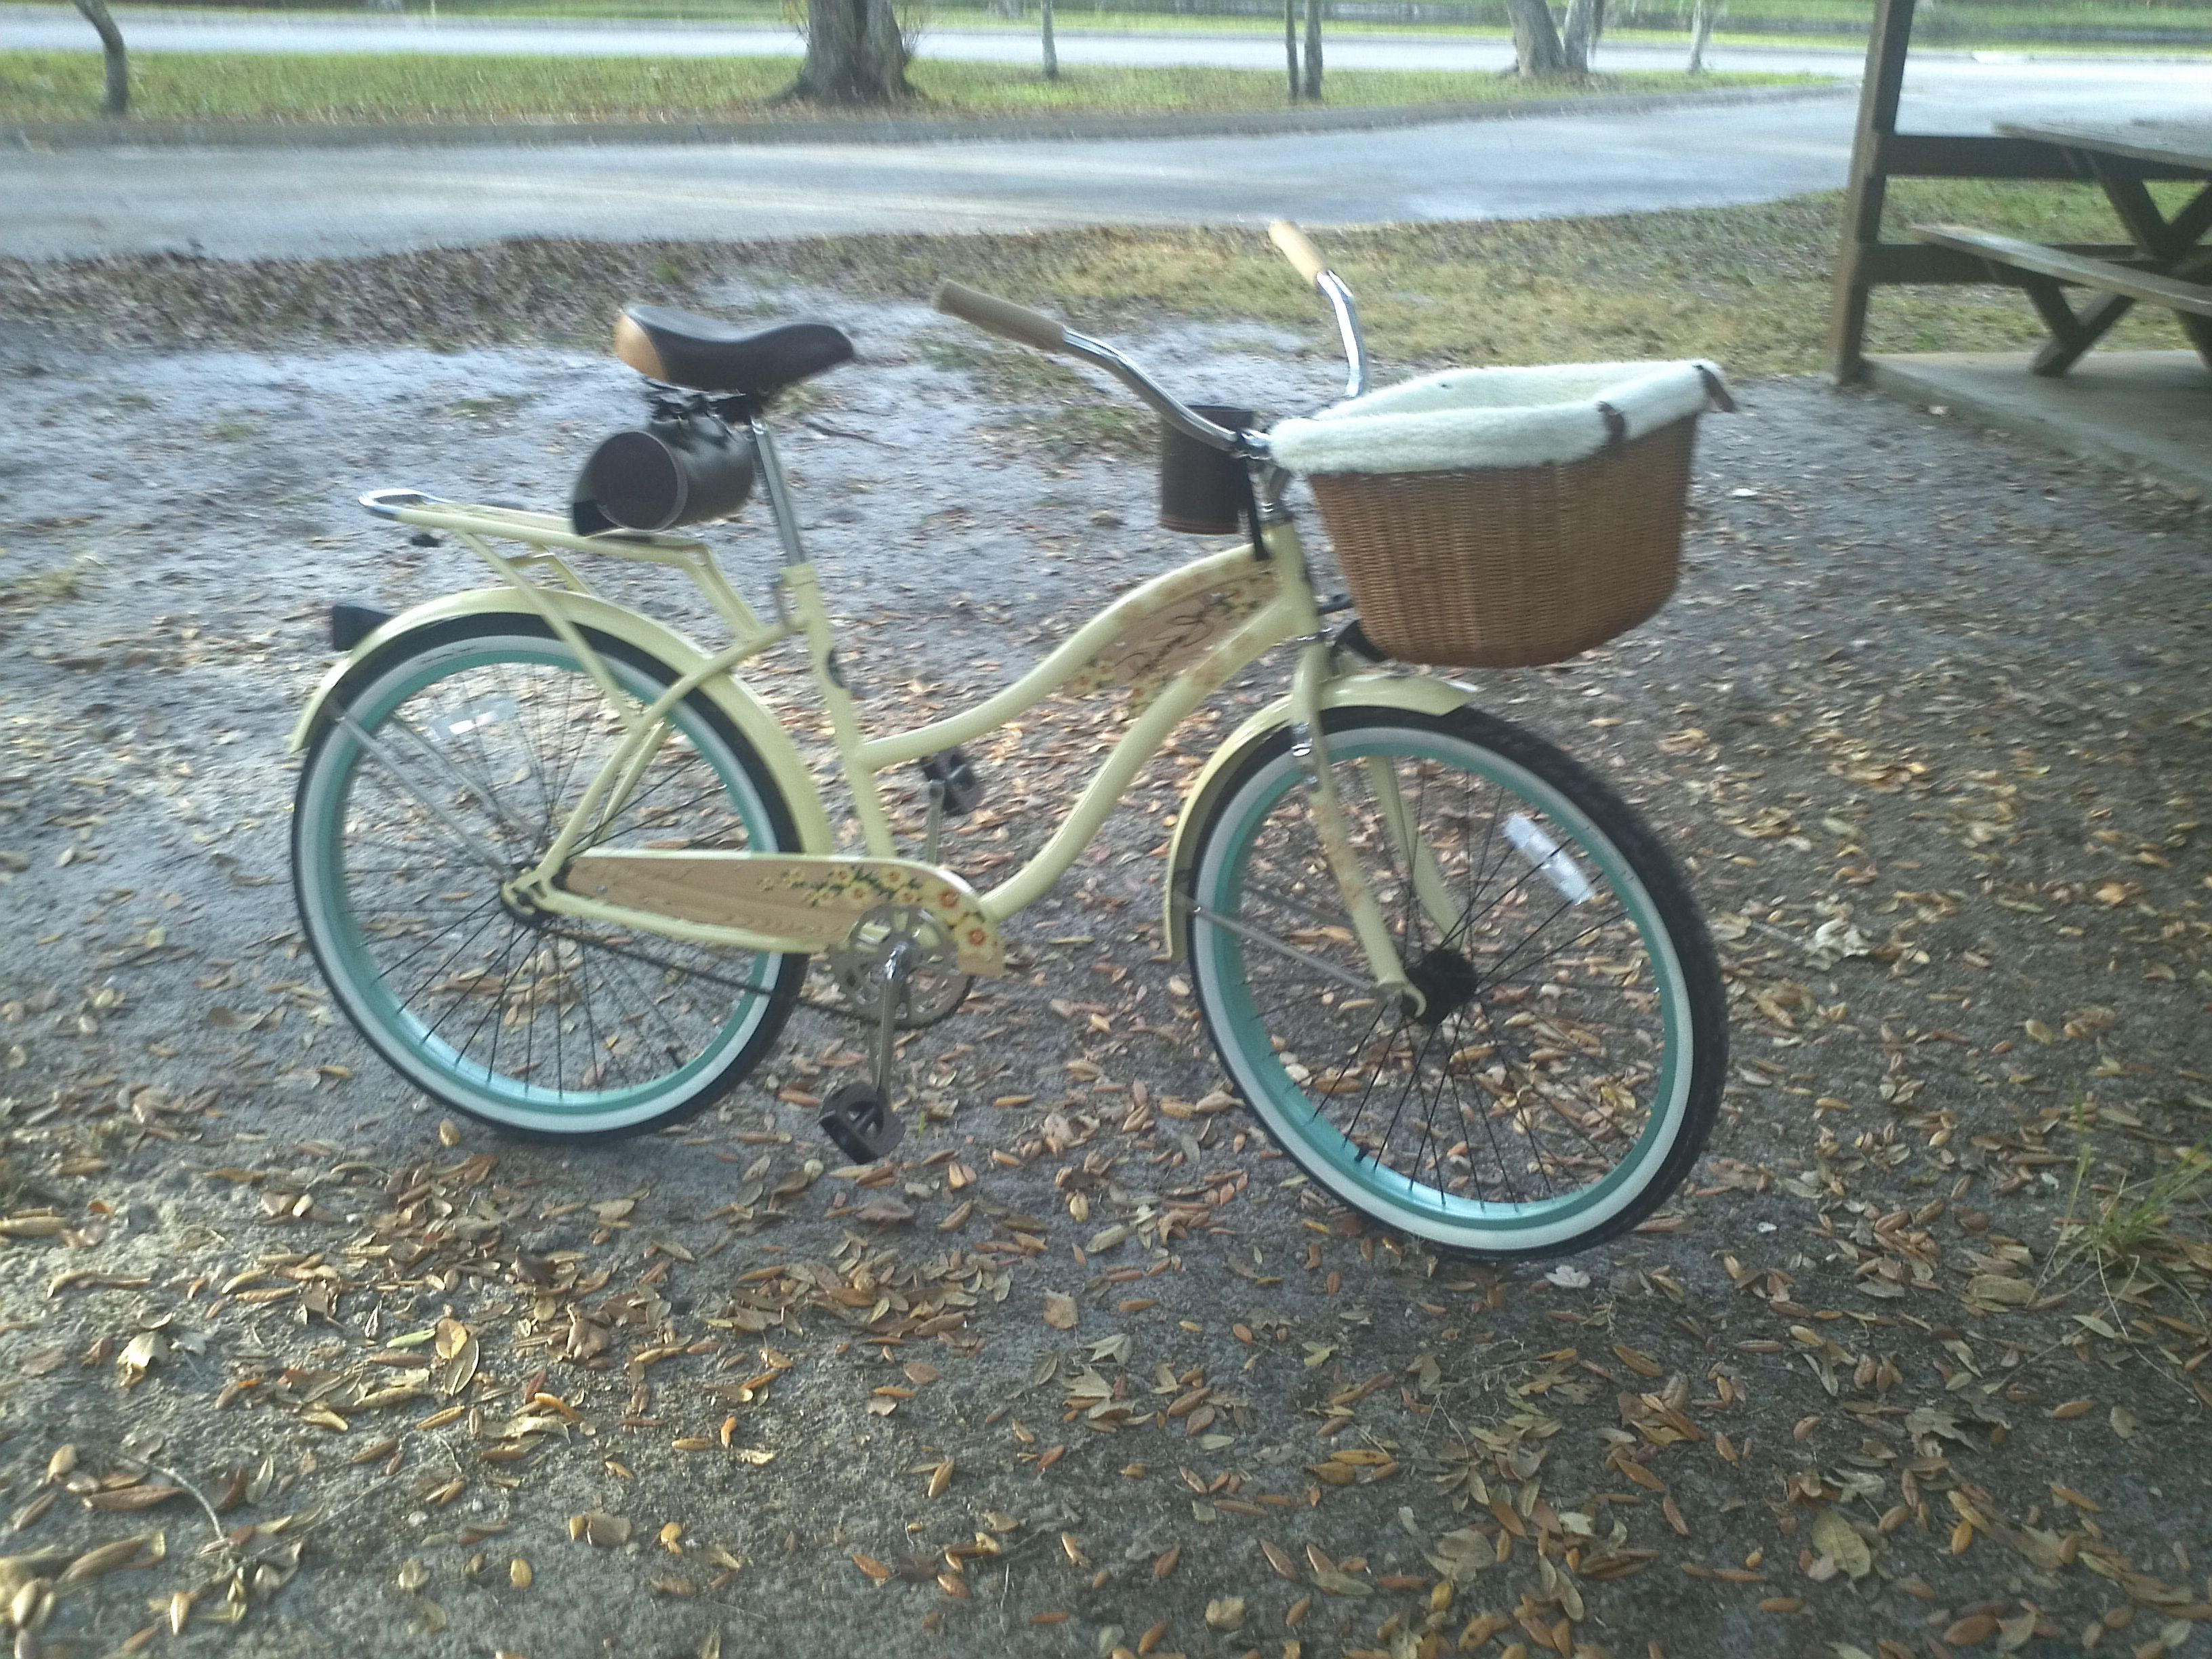 Panama Jack Vintage Bike But With The Basket Just A Smidge